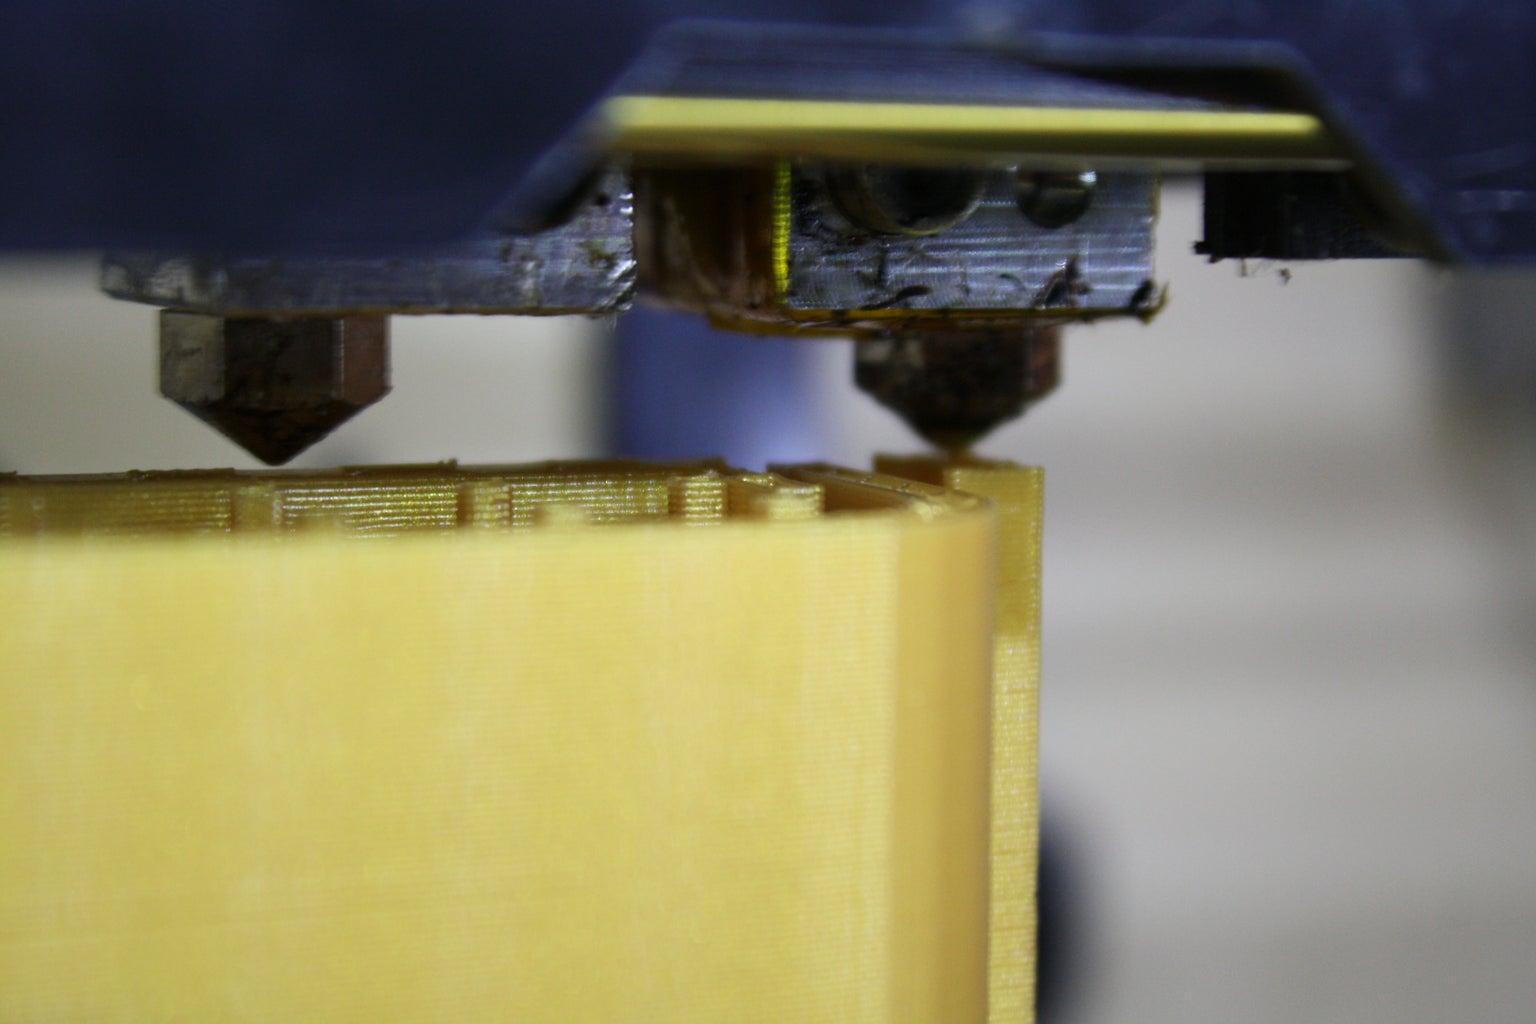 3D Printing Parts